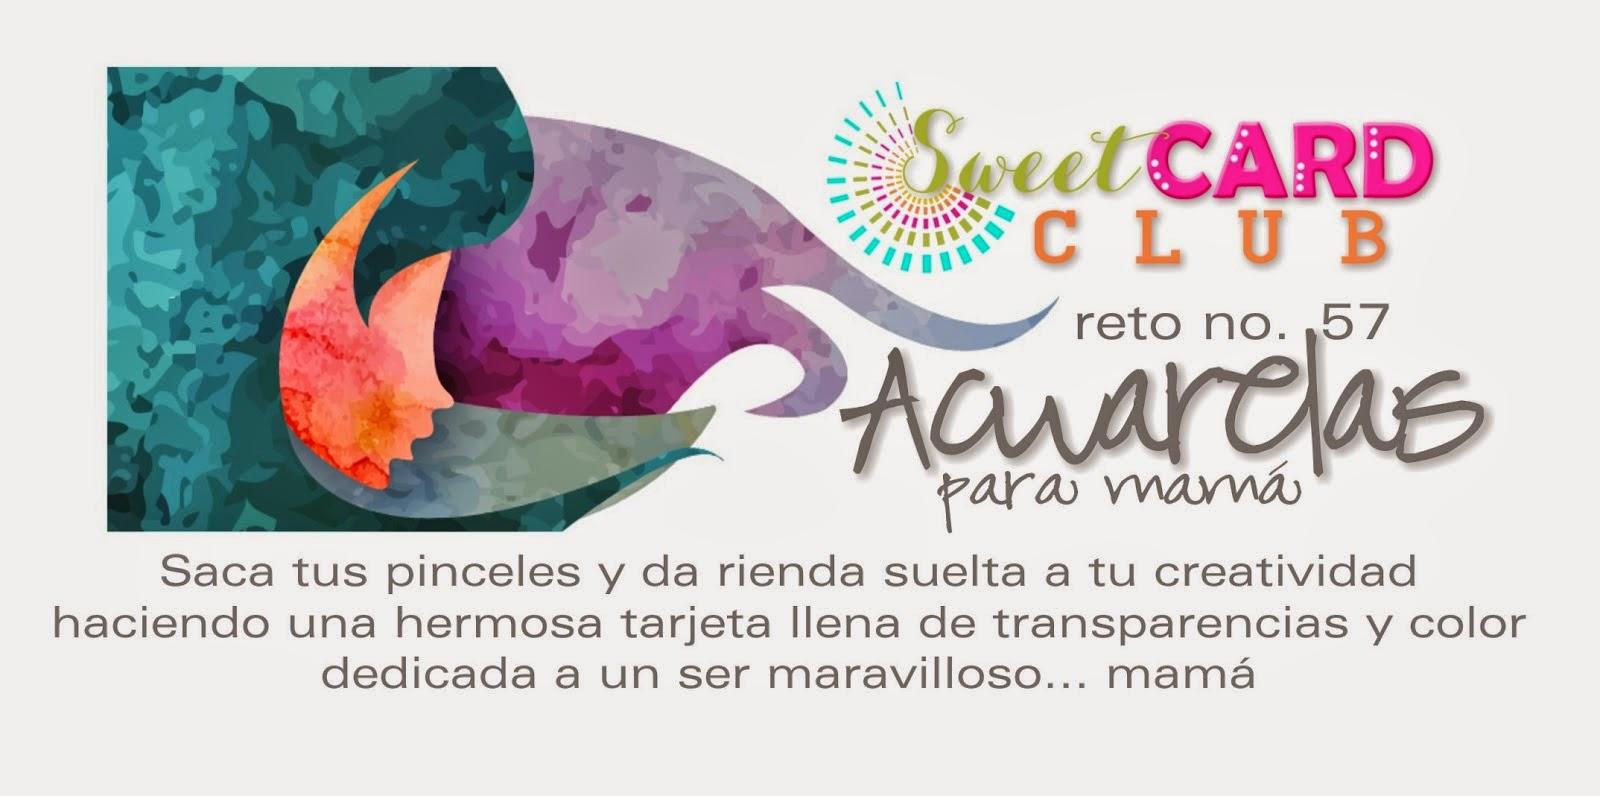 http://sweetcardclub.blogspot.mx/2015/05/reto-57-acuarelas.html